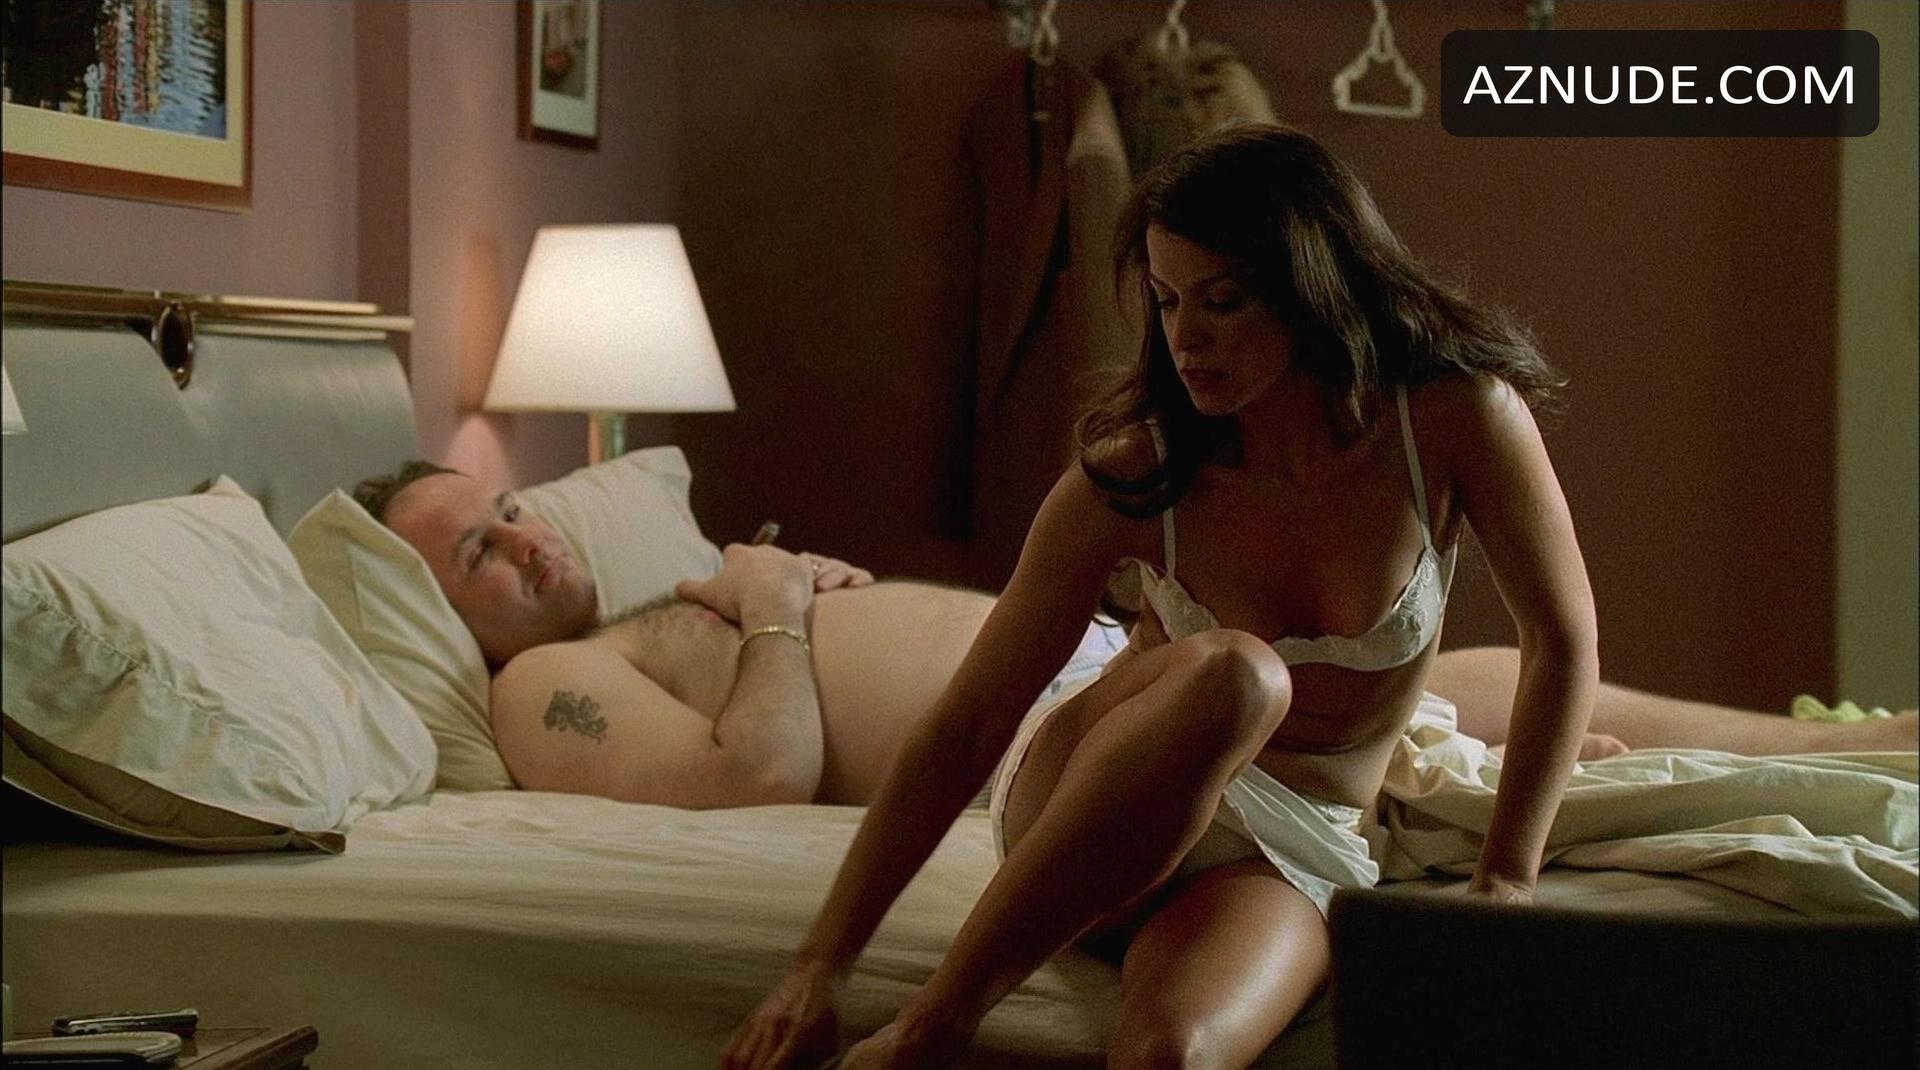 Hot kim kardashian nude playboy